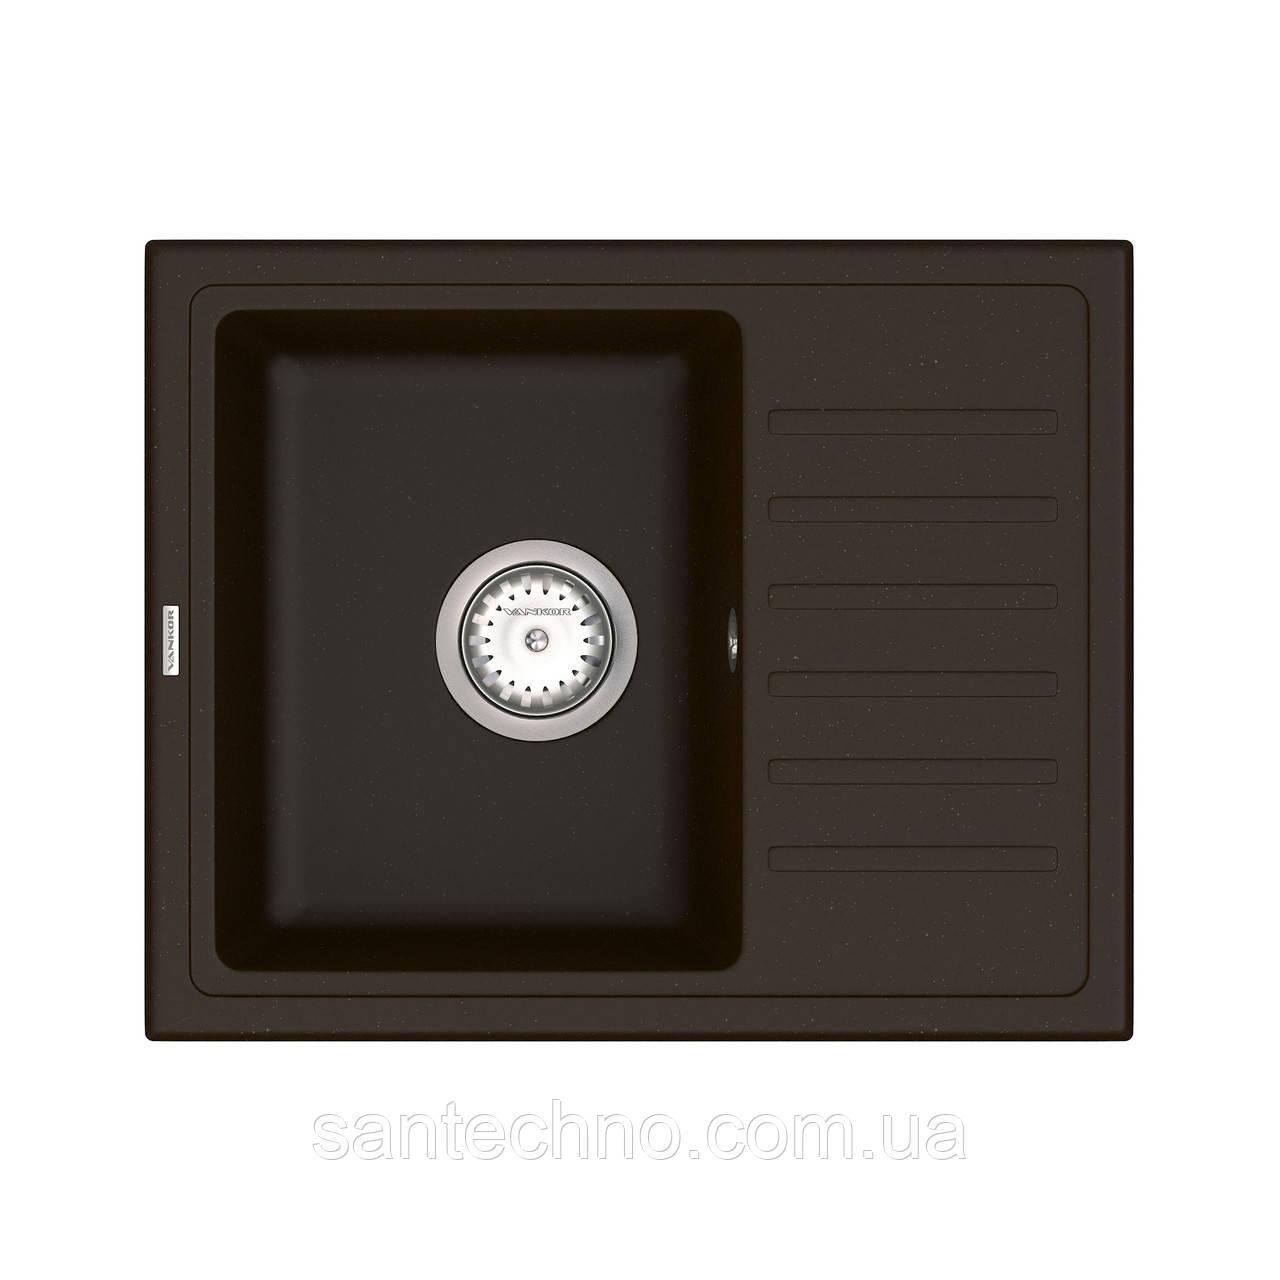 Прямокутна кухонна мийка коричнева VANKOR Lira LMP 02.55 Chocolate + сифон VANKOR